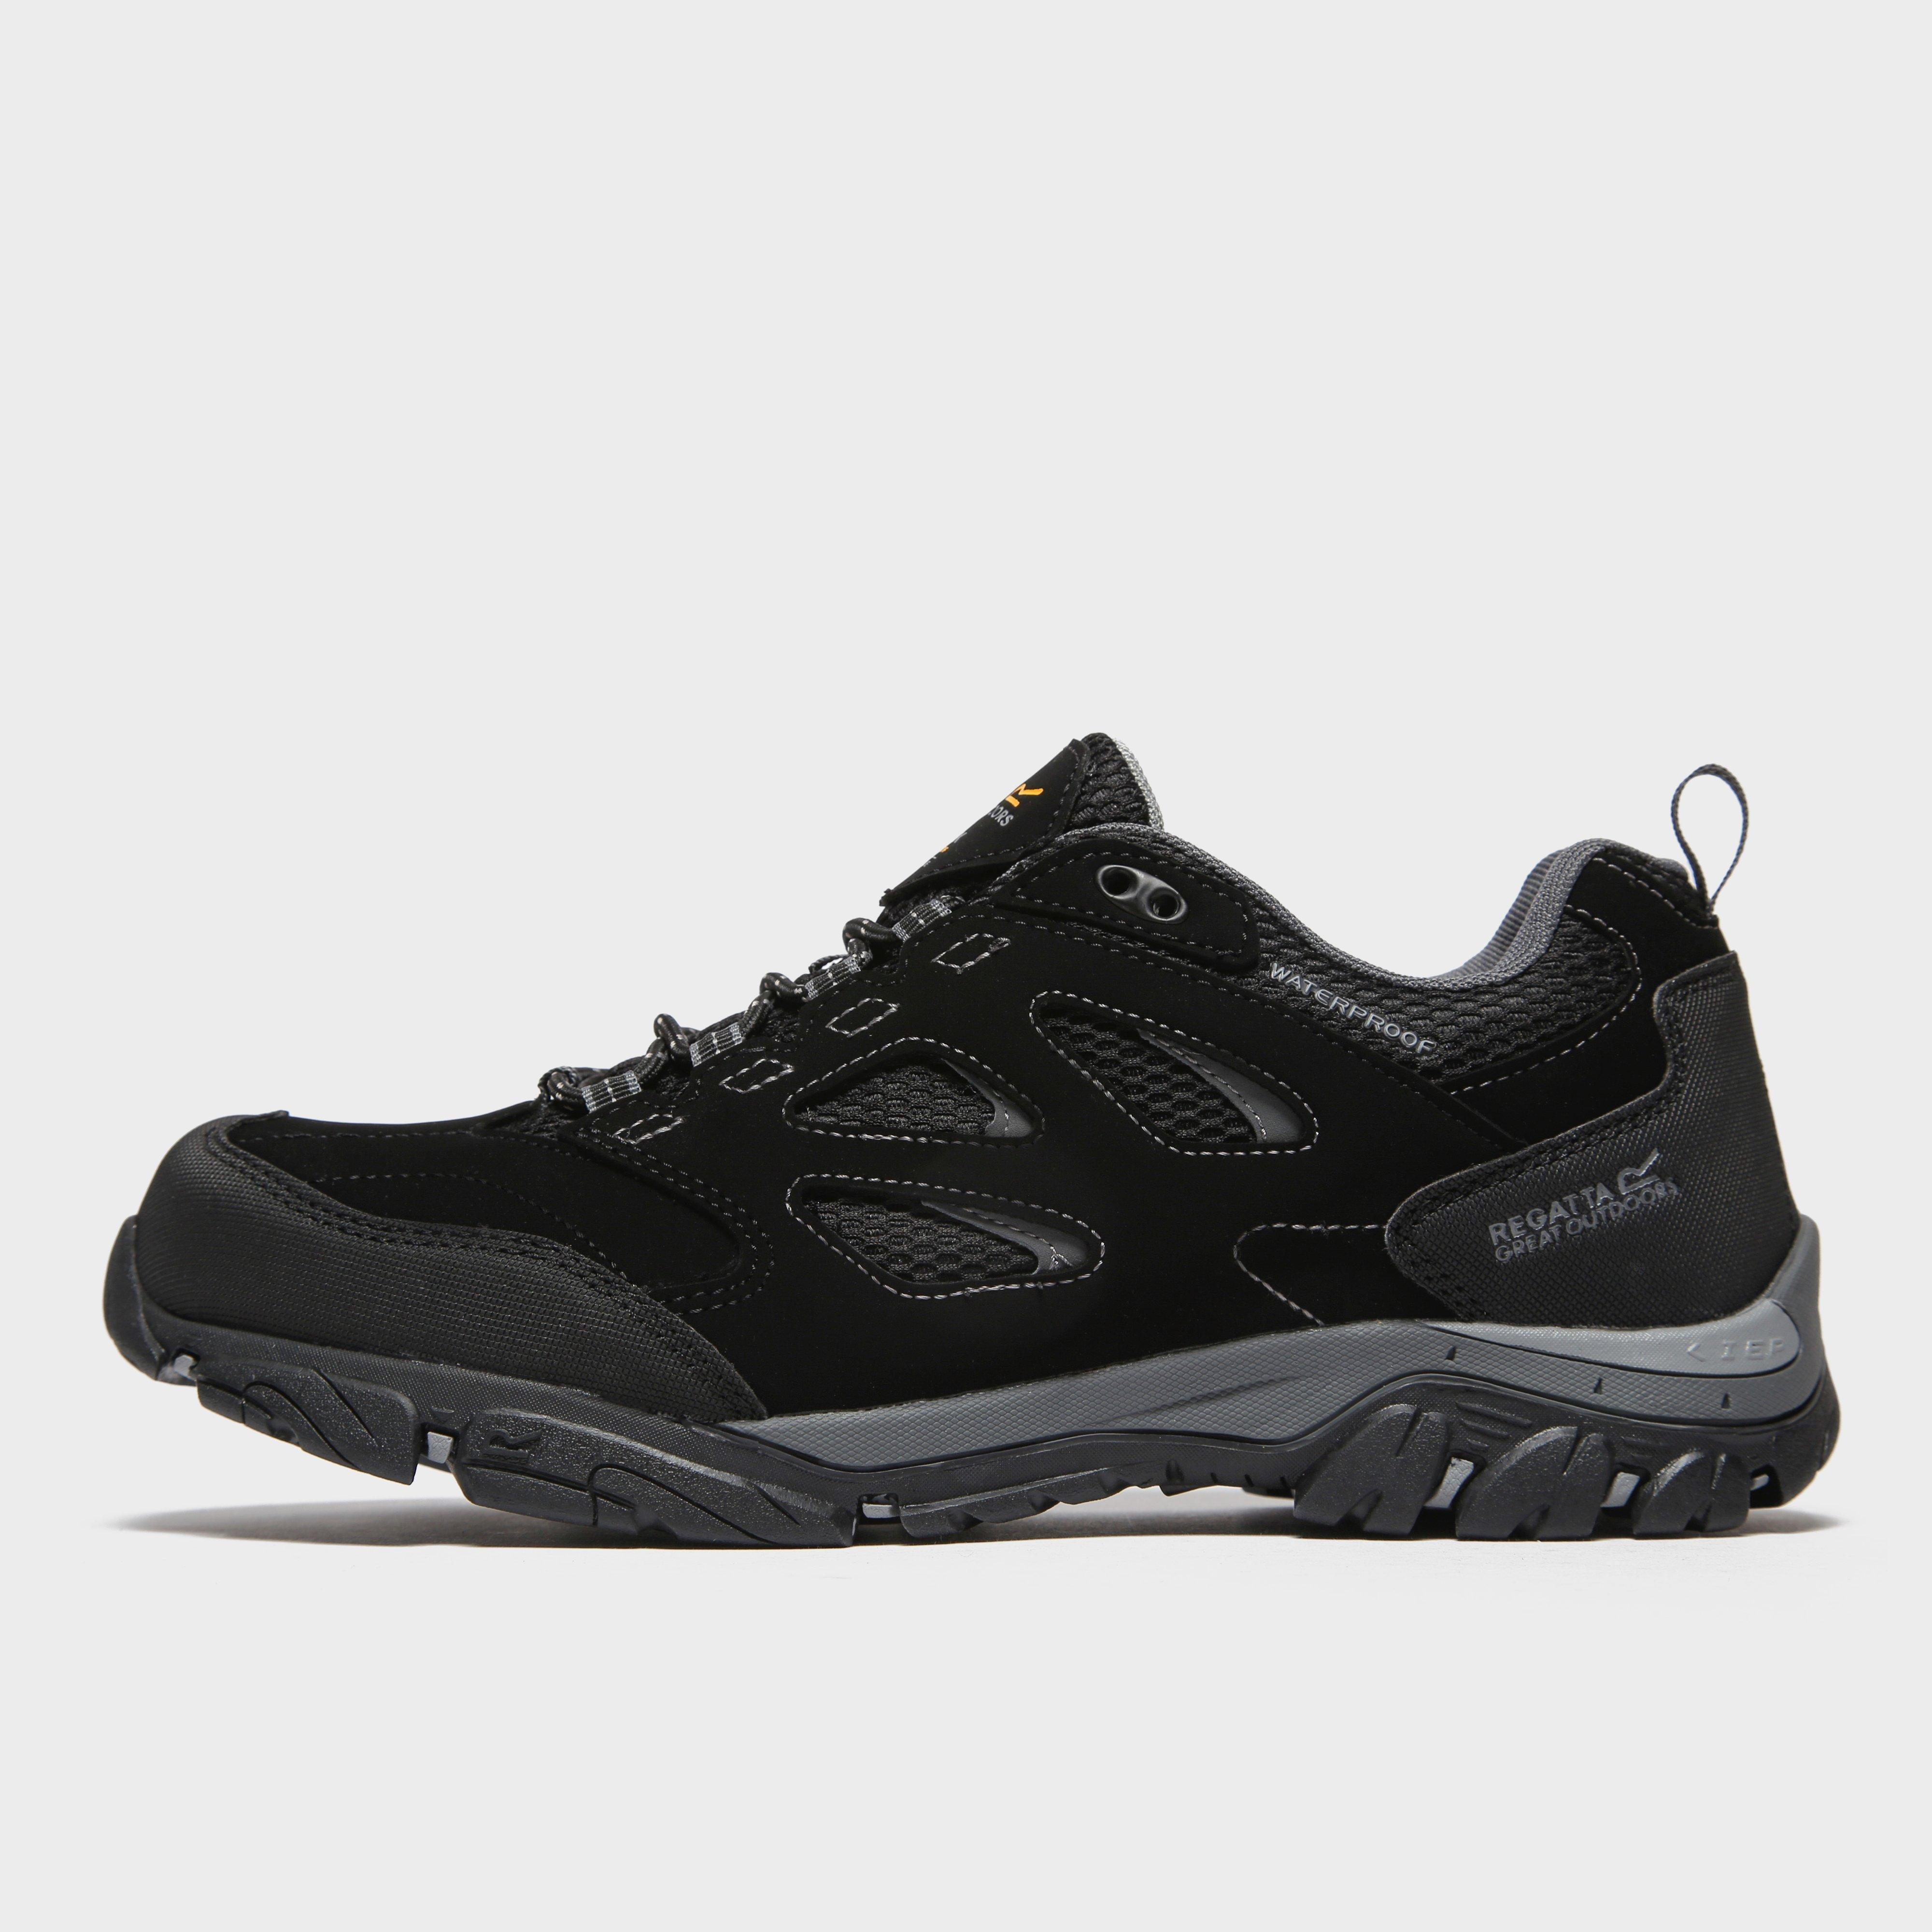 Regatta Regatta Mens Holcombe IEP Low Shoes